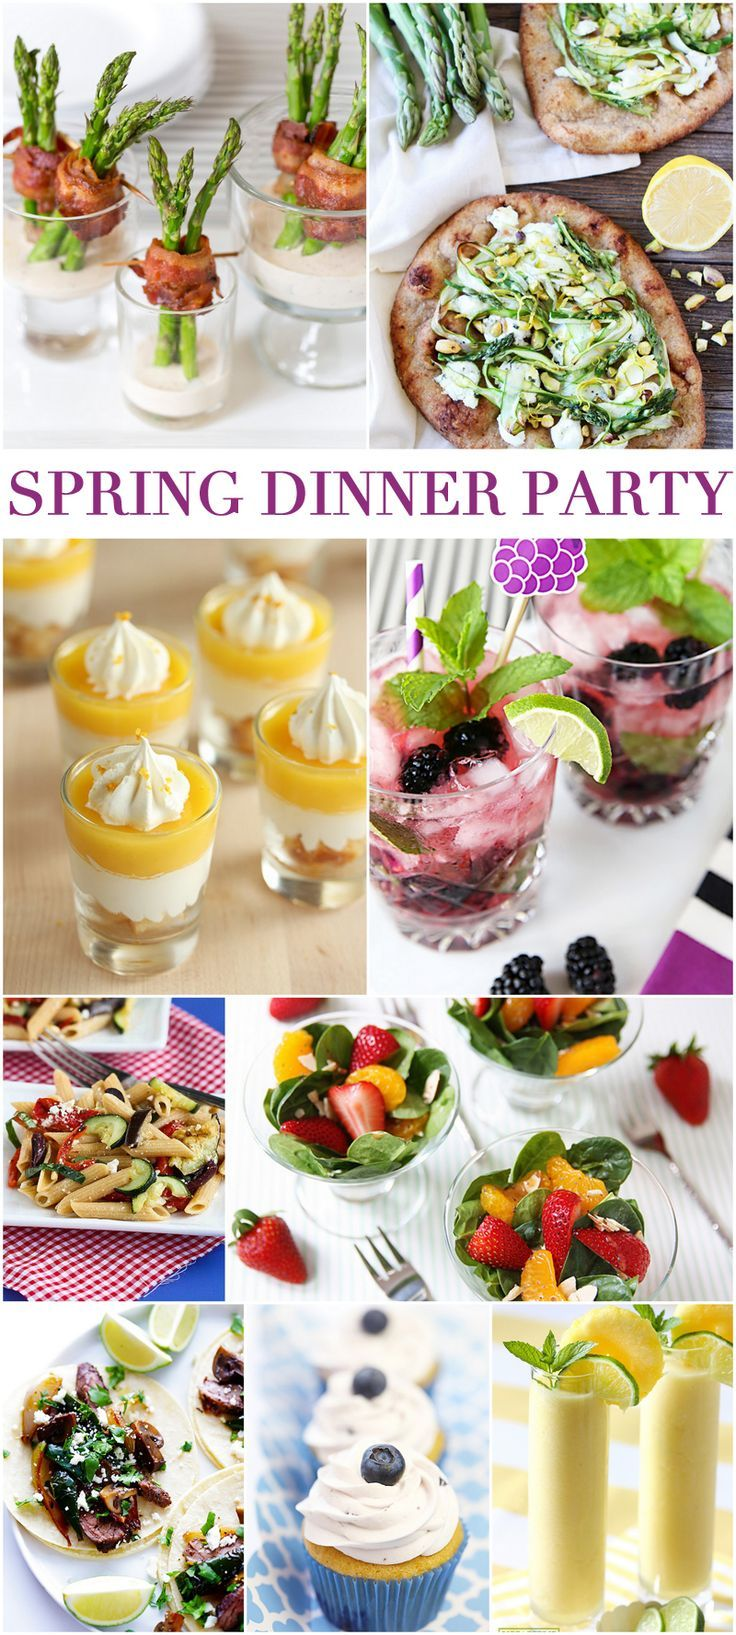 host a spring dinner